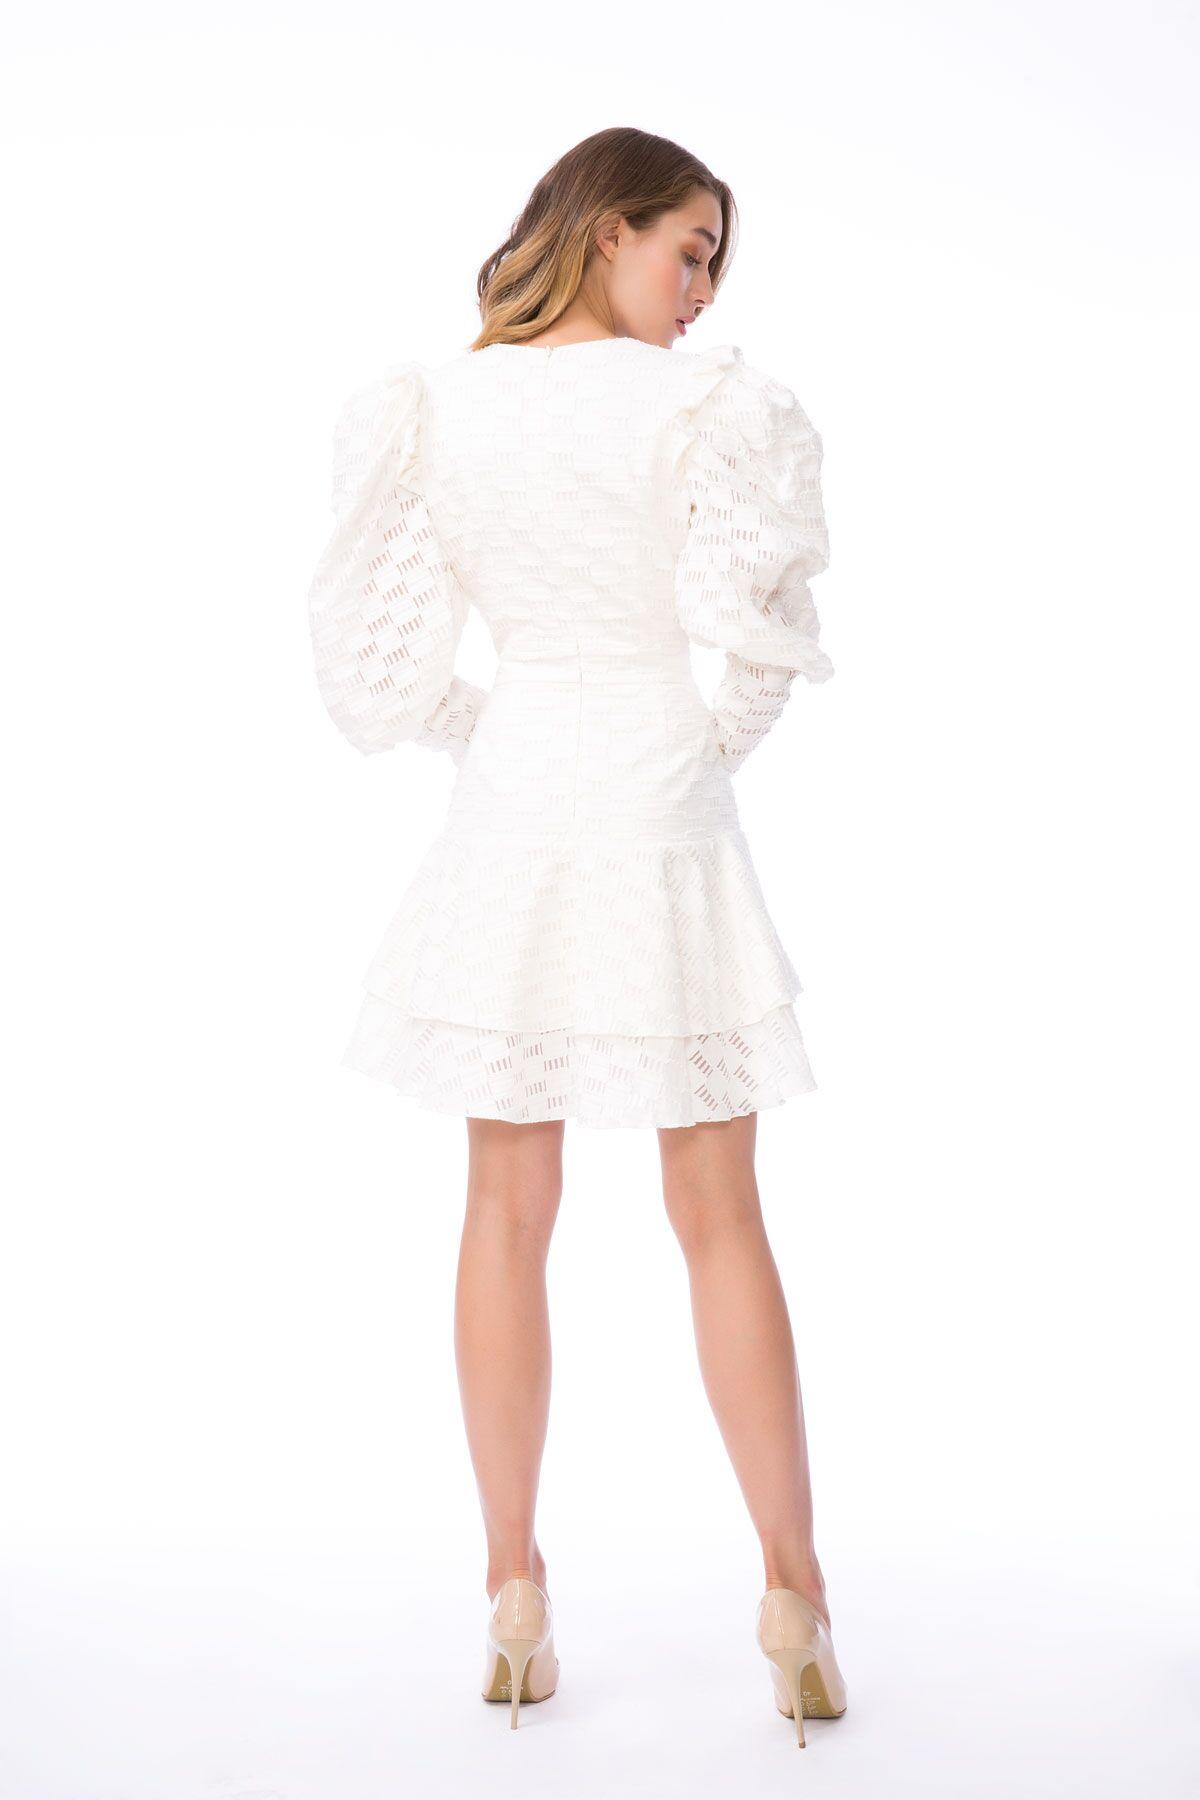 Taş İşleme Detaylı Volan Kollu Ekru Mini Elbise